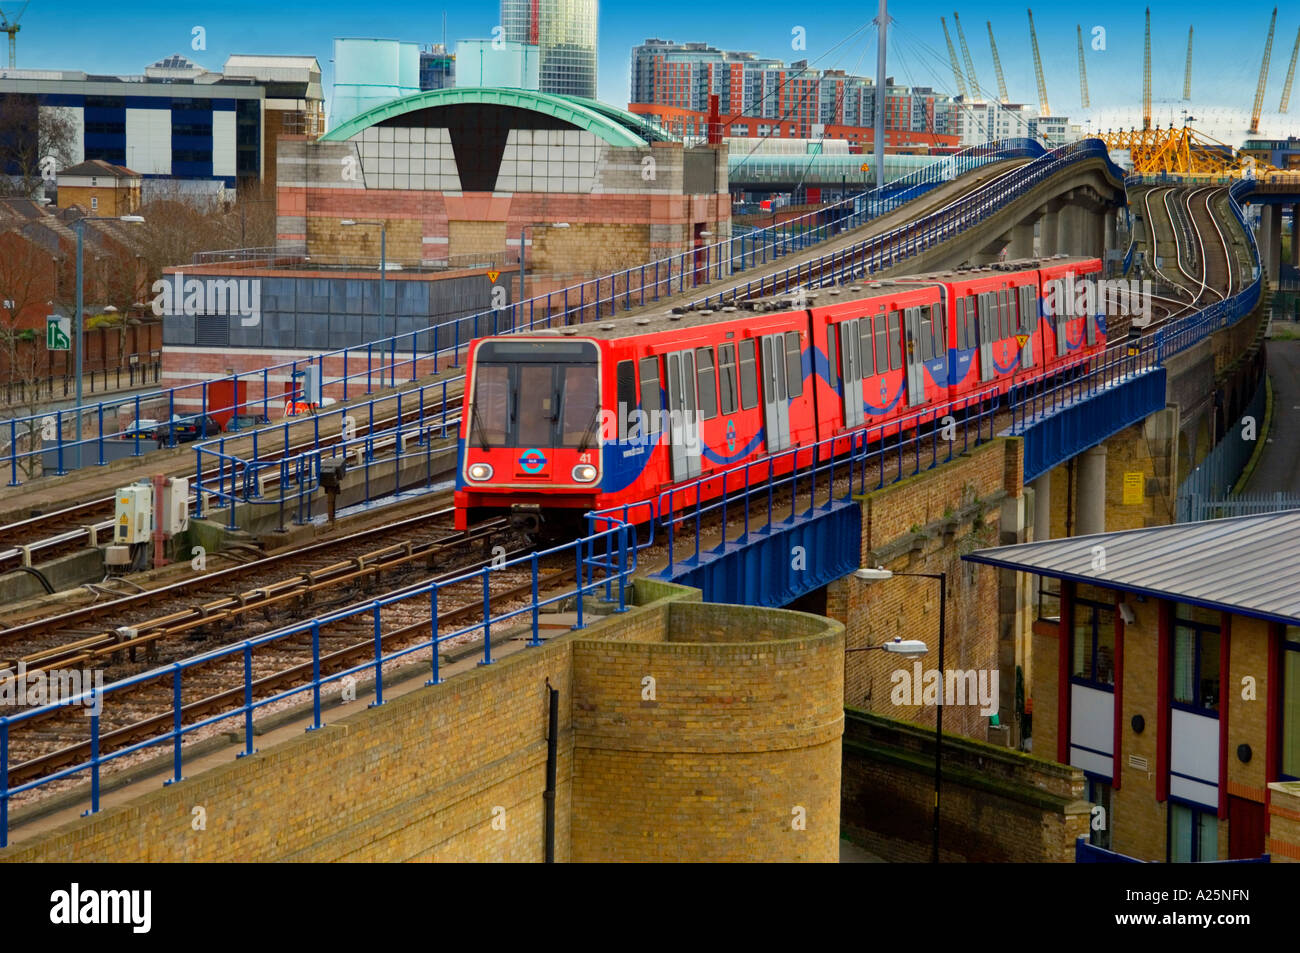 https://c8.alamy.com/comp/A25NFN/dlr-train-docklands-light-railway-going-over-viaduct-bridge-isle-of-A25NFN.jpg